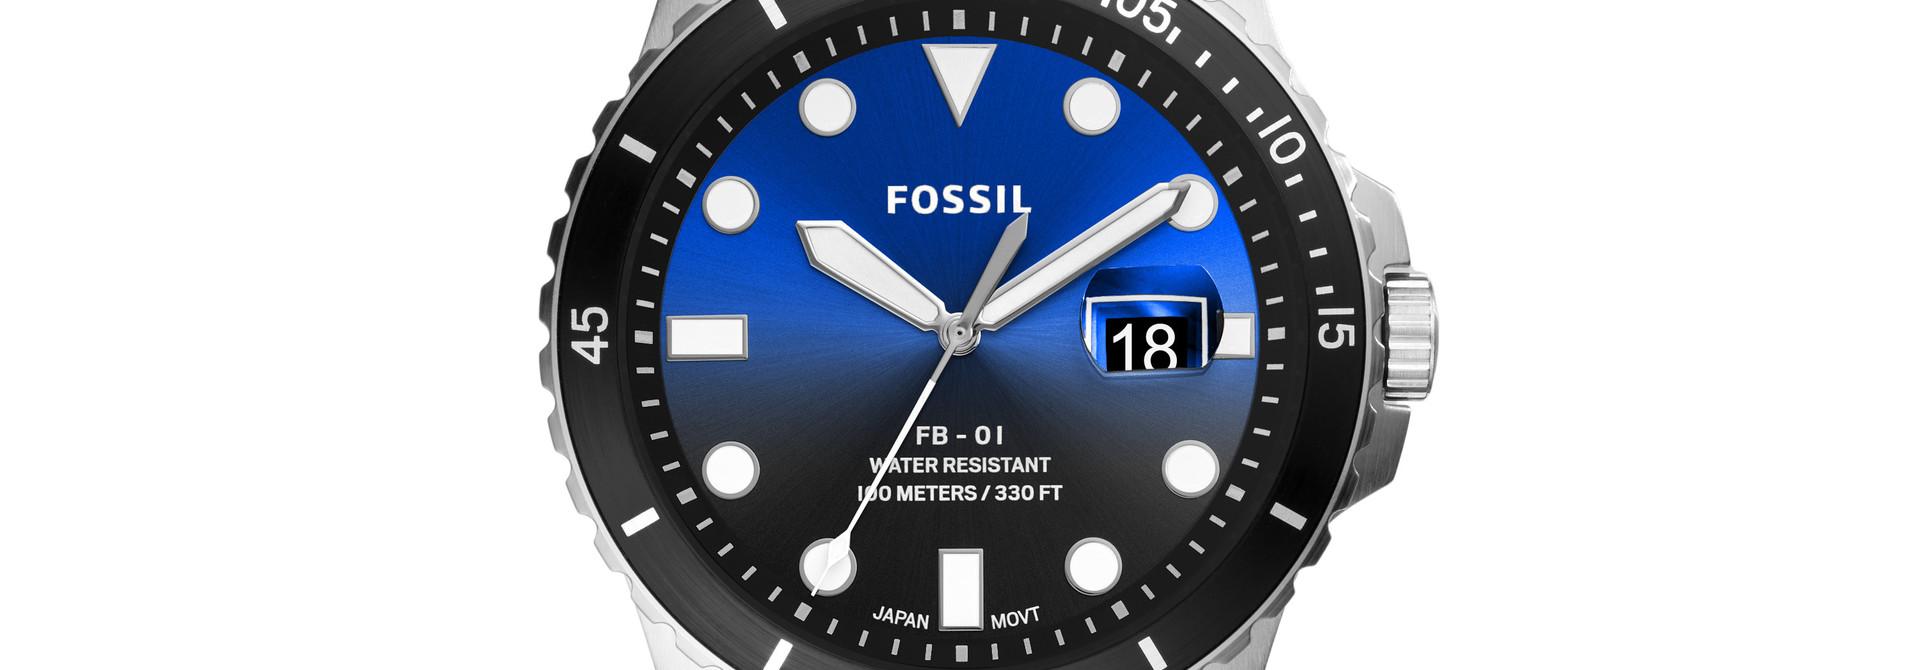 Fossil Heren Horloge Fb - 01 FS5668